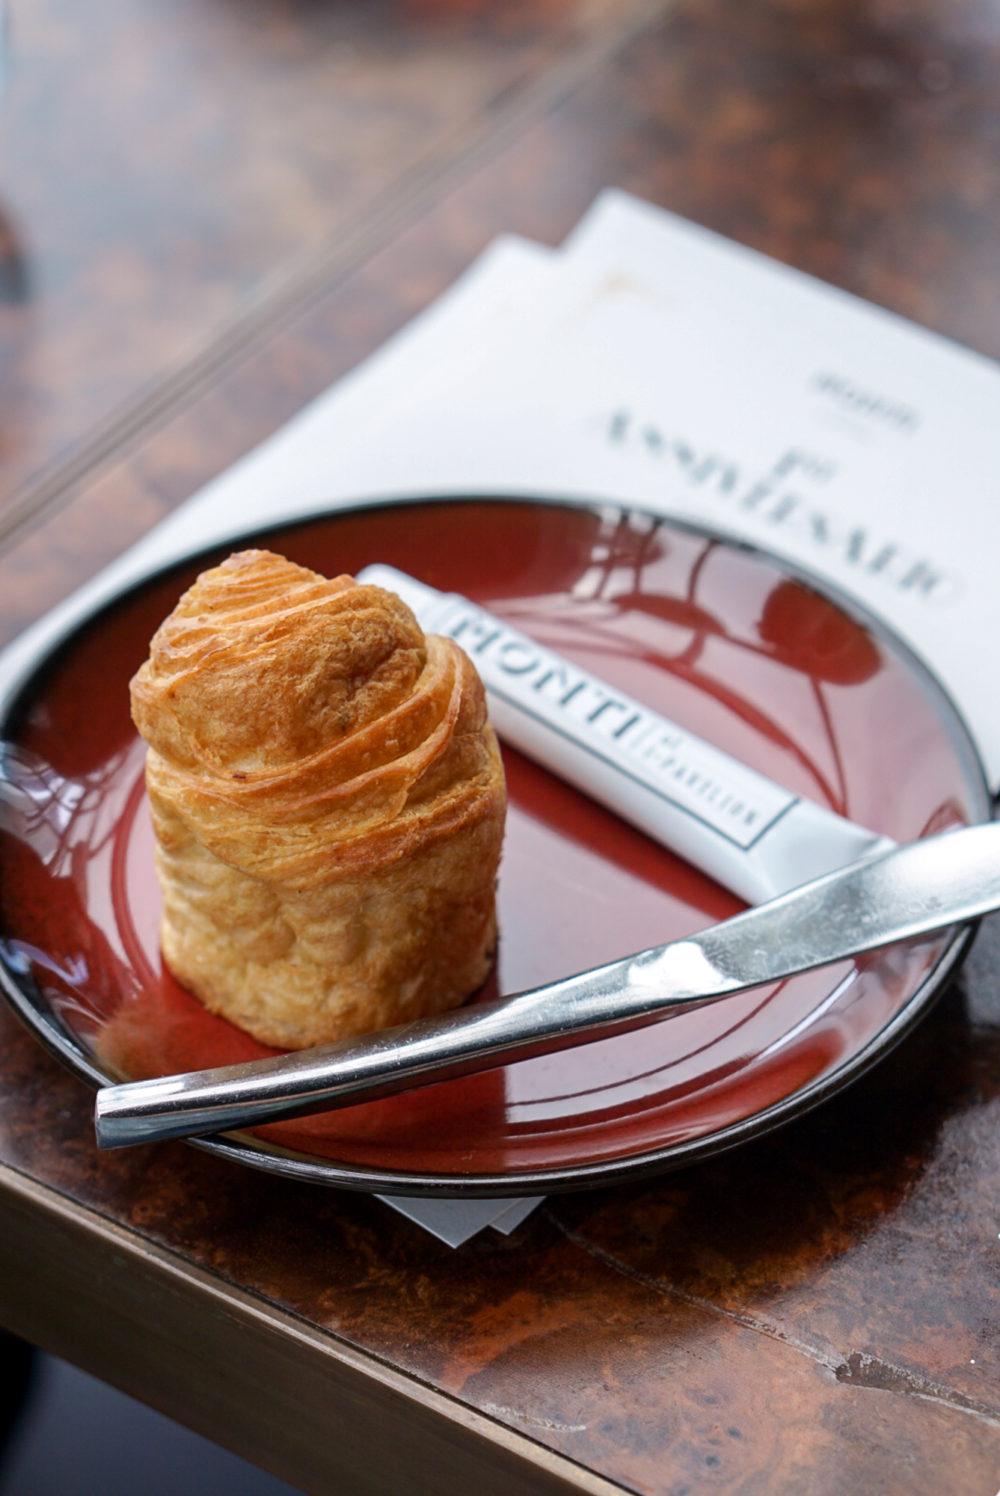 Monti Singapore 1st Anniversario - Bread